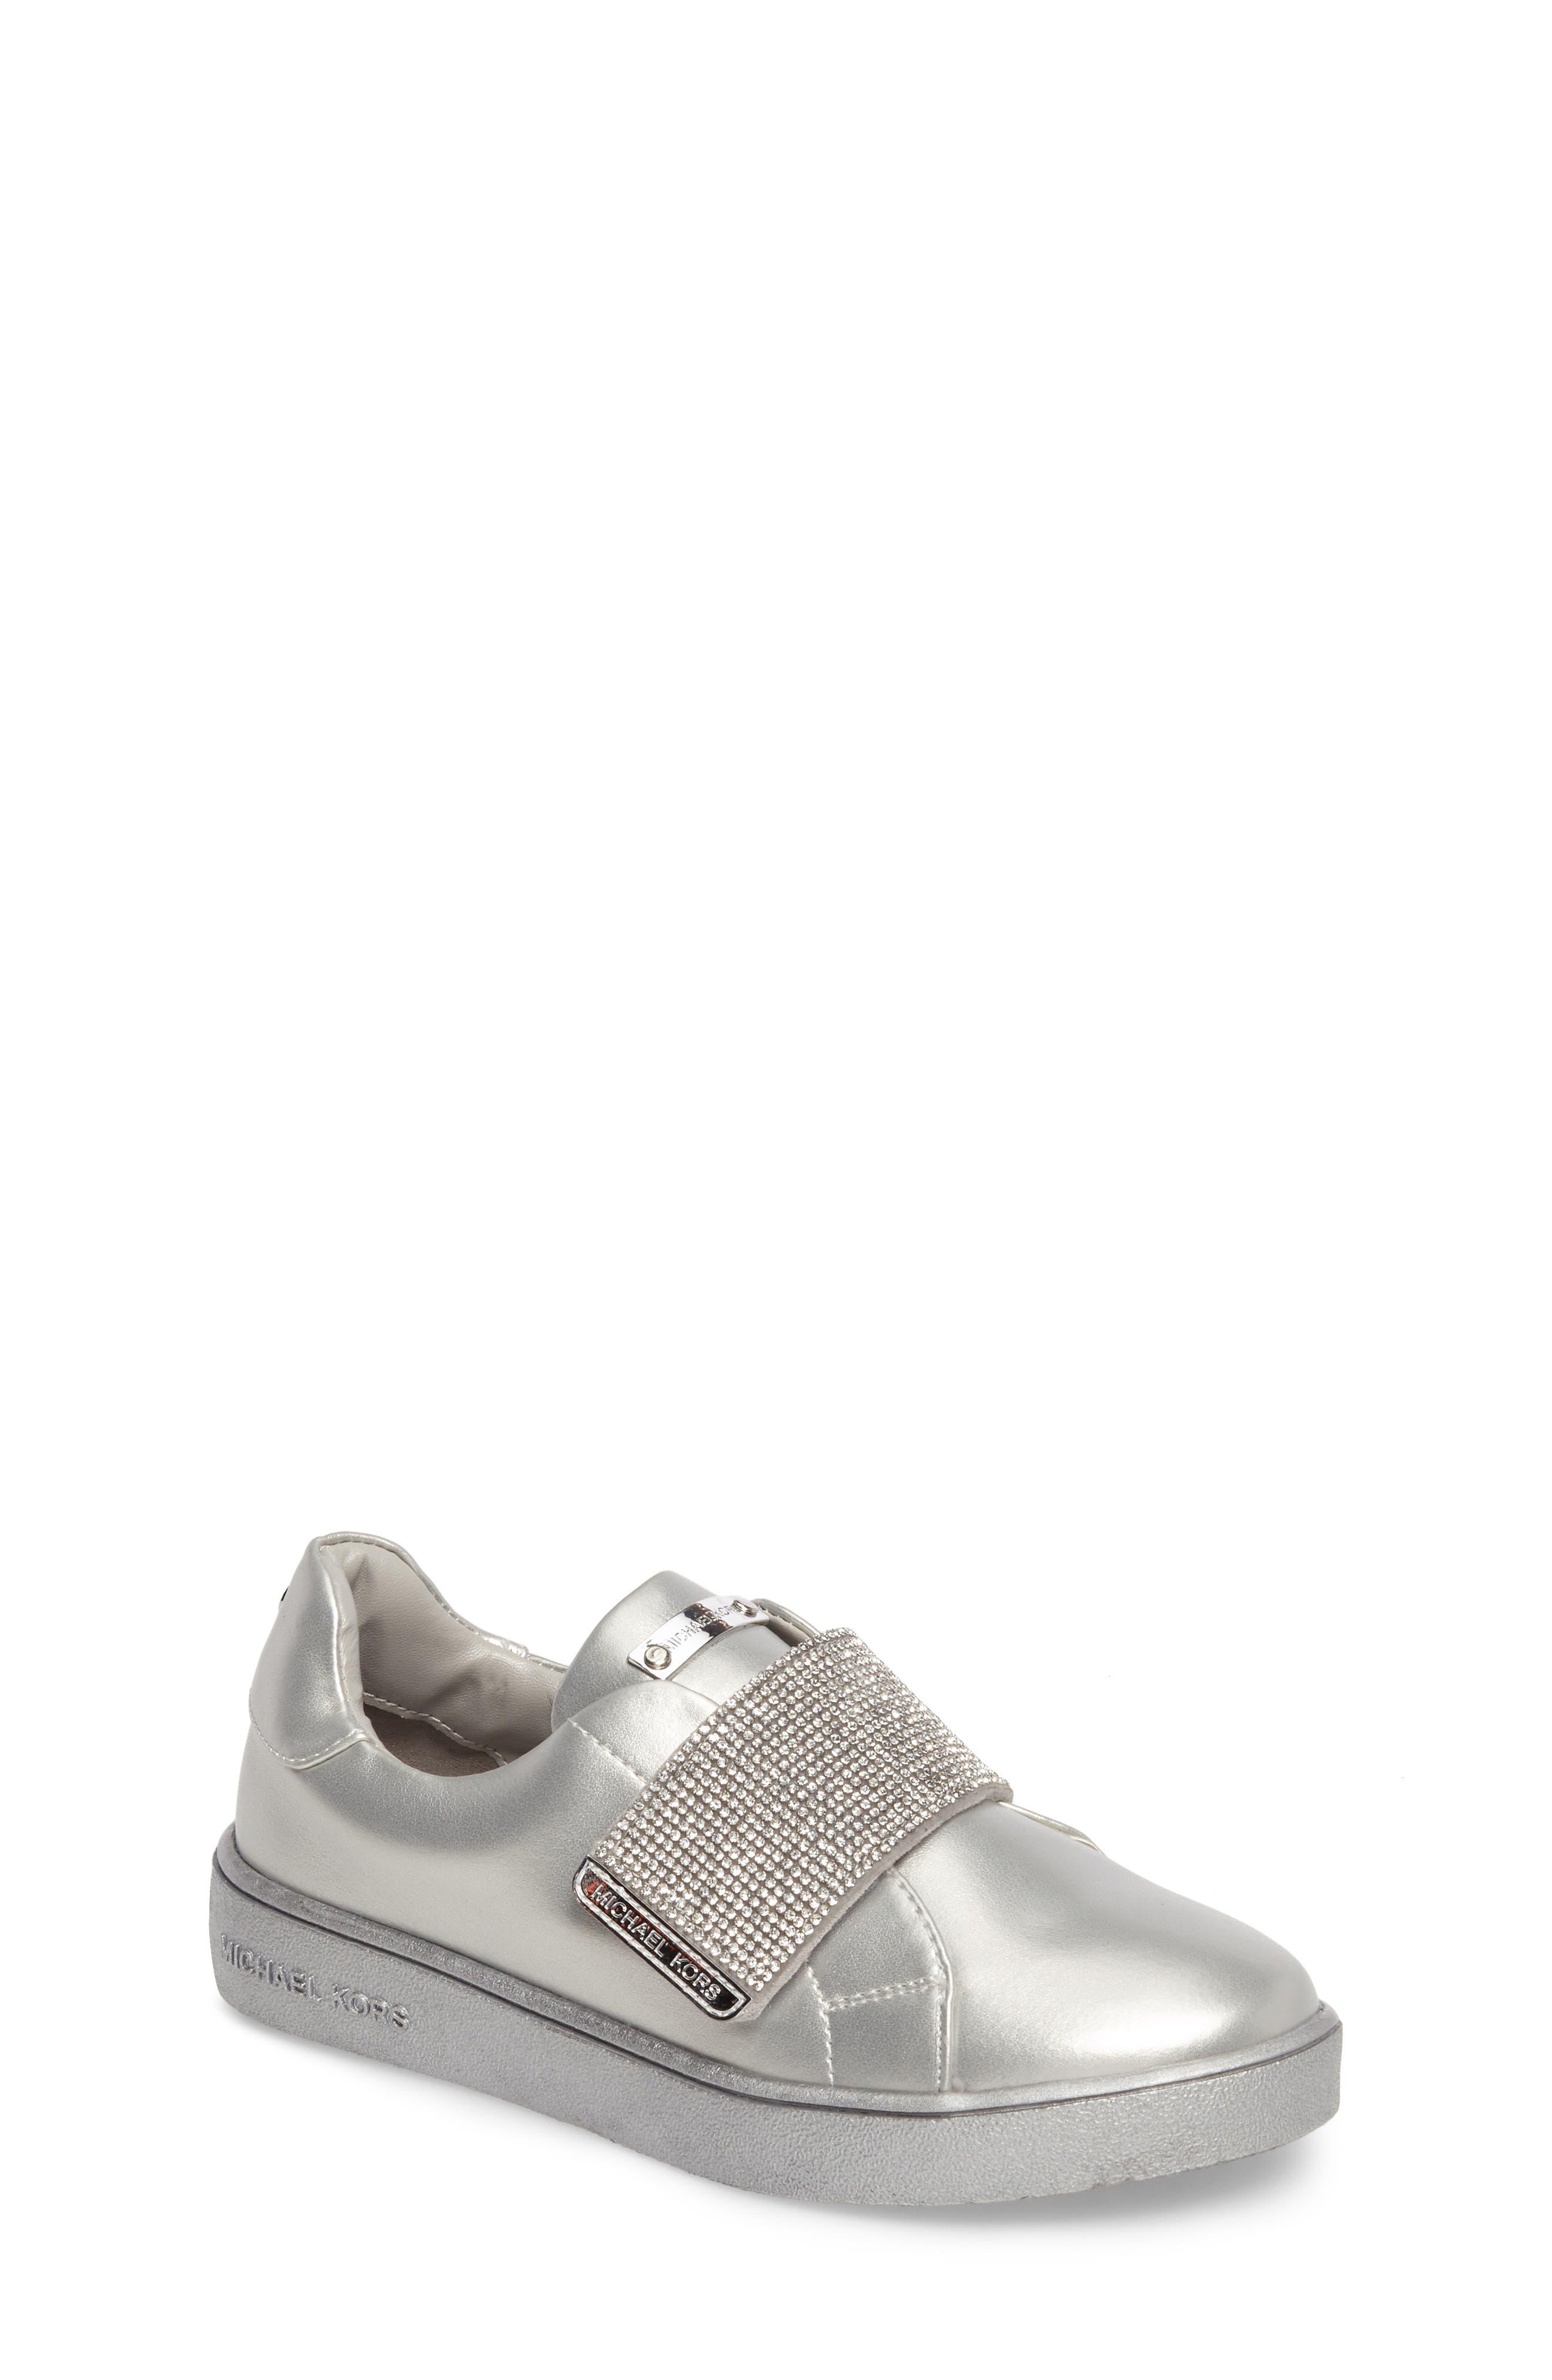 MICHAEL Michael Kors Ivy Candy Sneaker (Walker, Toddler, Little Kid & Big Kid)